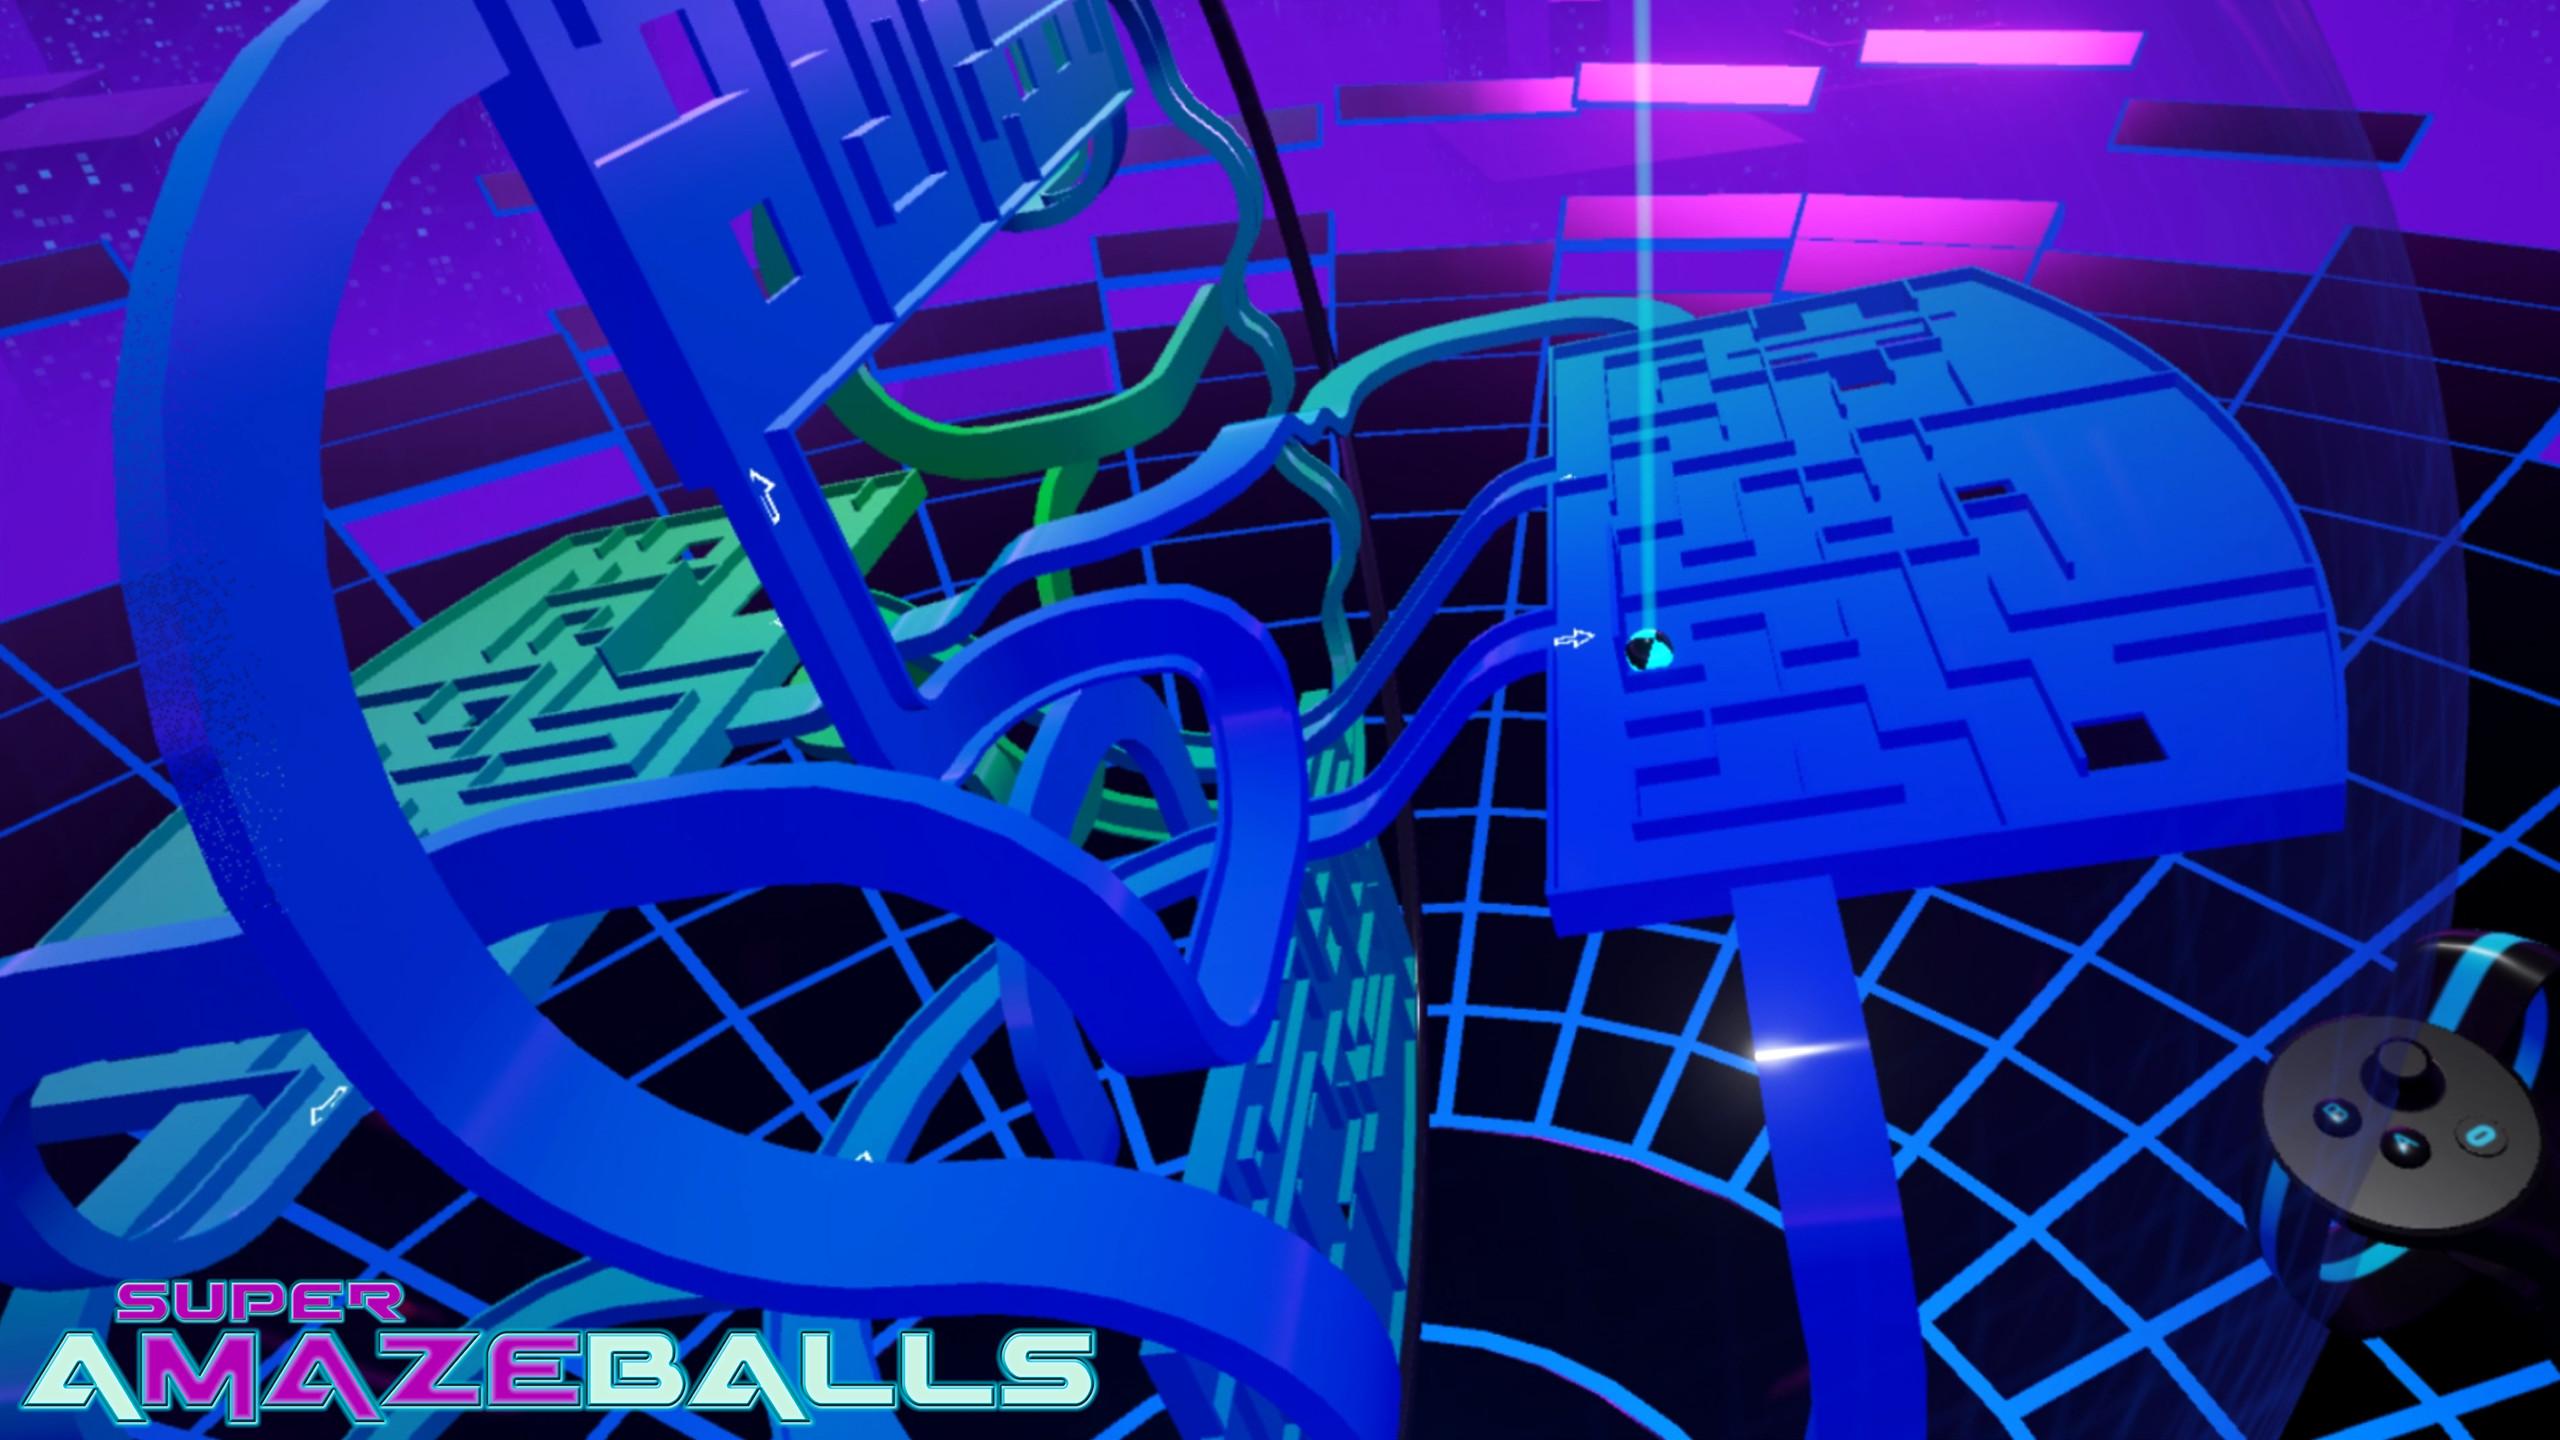 Super Amazeballs screenshot